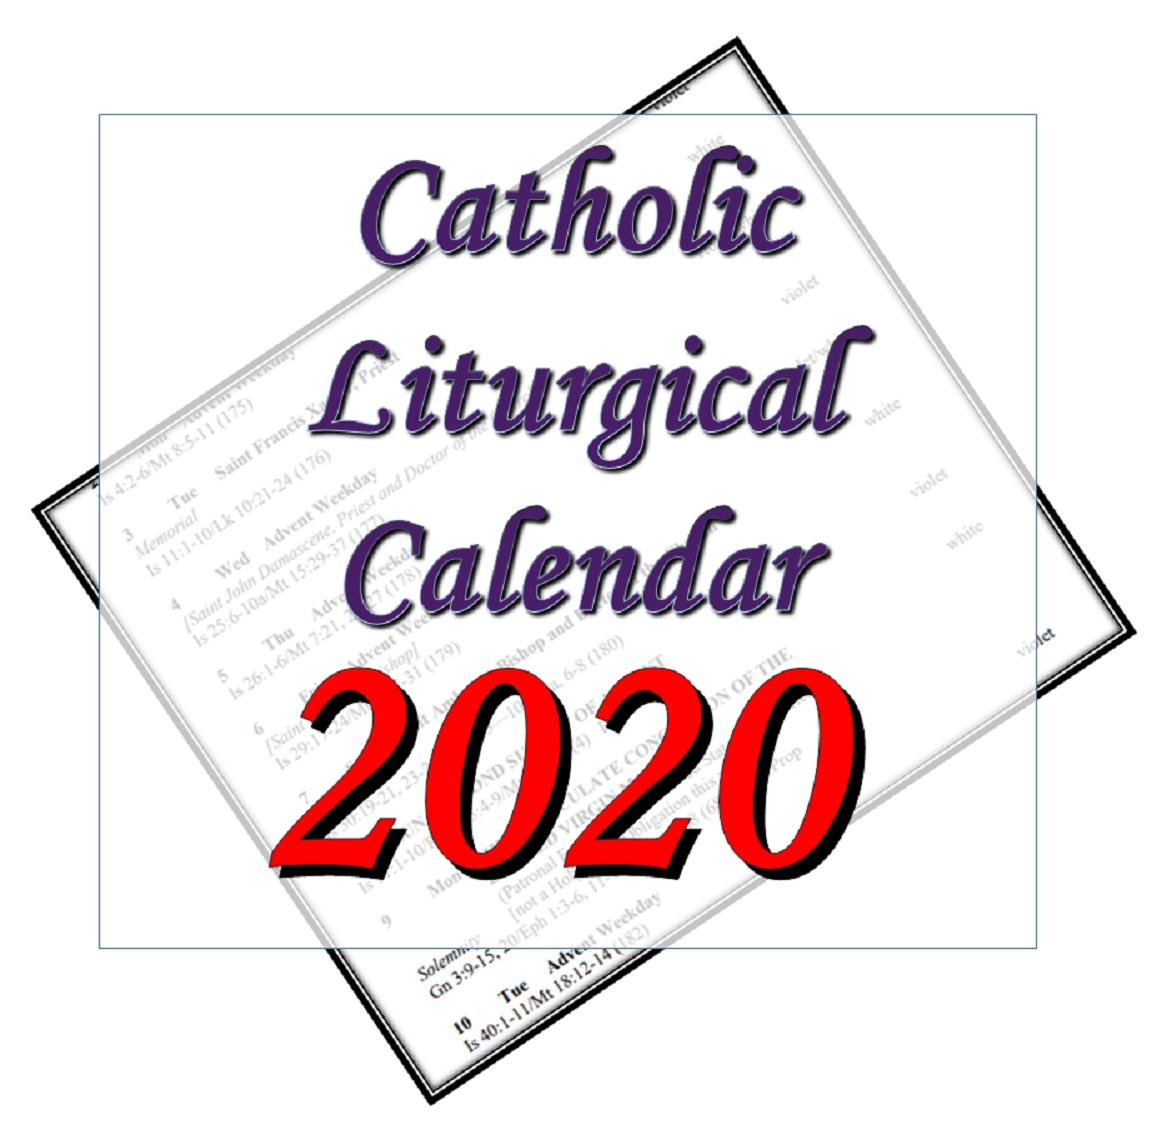 Liturgytools: Catholic Liturgical Calendars For 2020 within Catholic Liturgical Calender Year C: